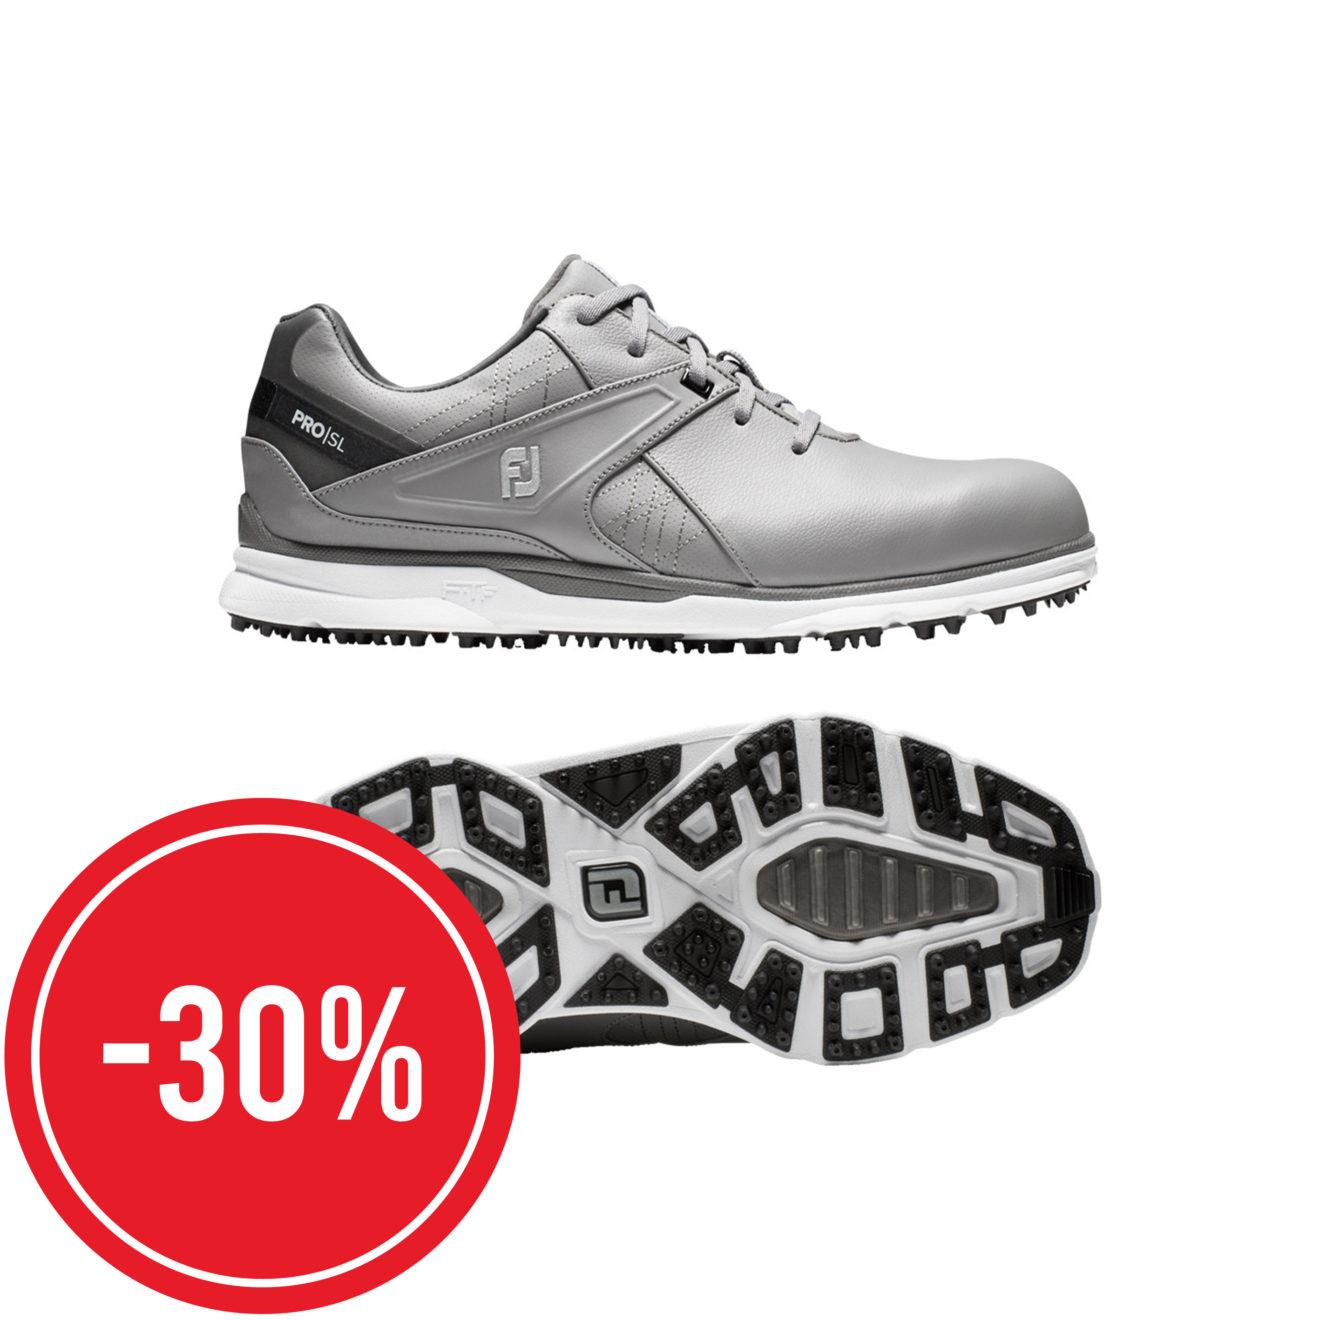 chaussures-footjoy-pro-sl-gris